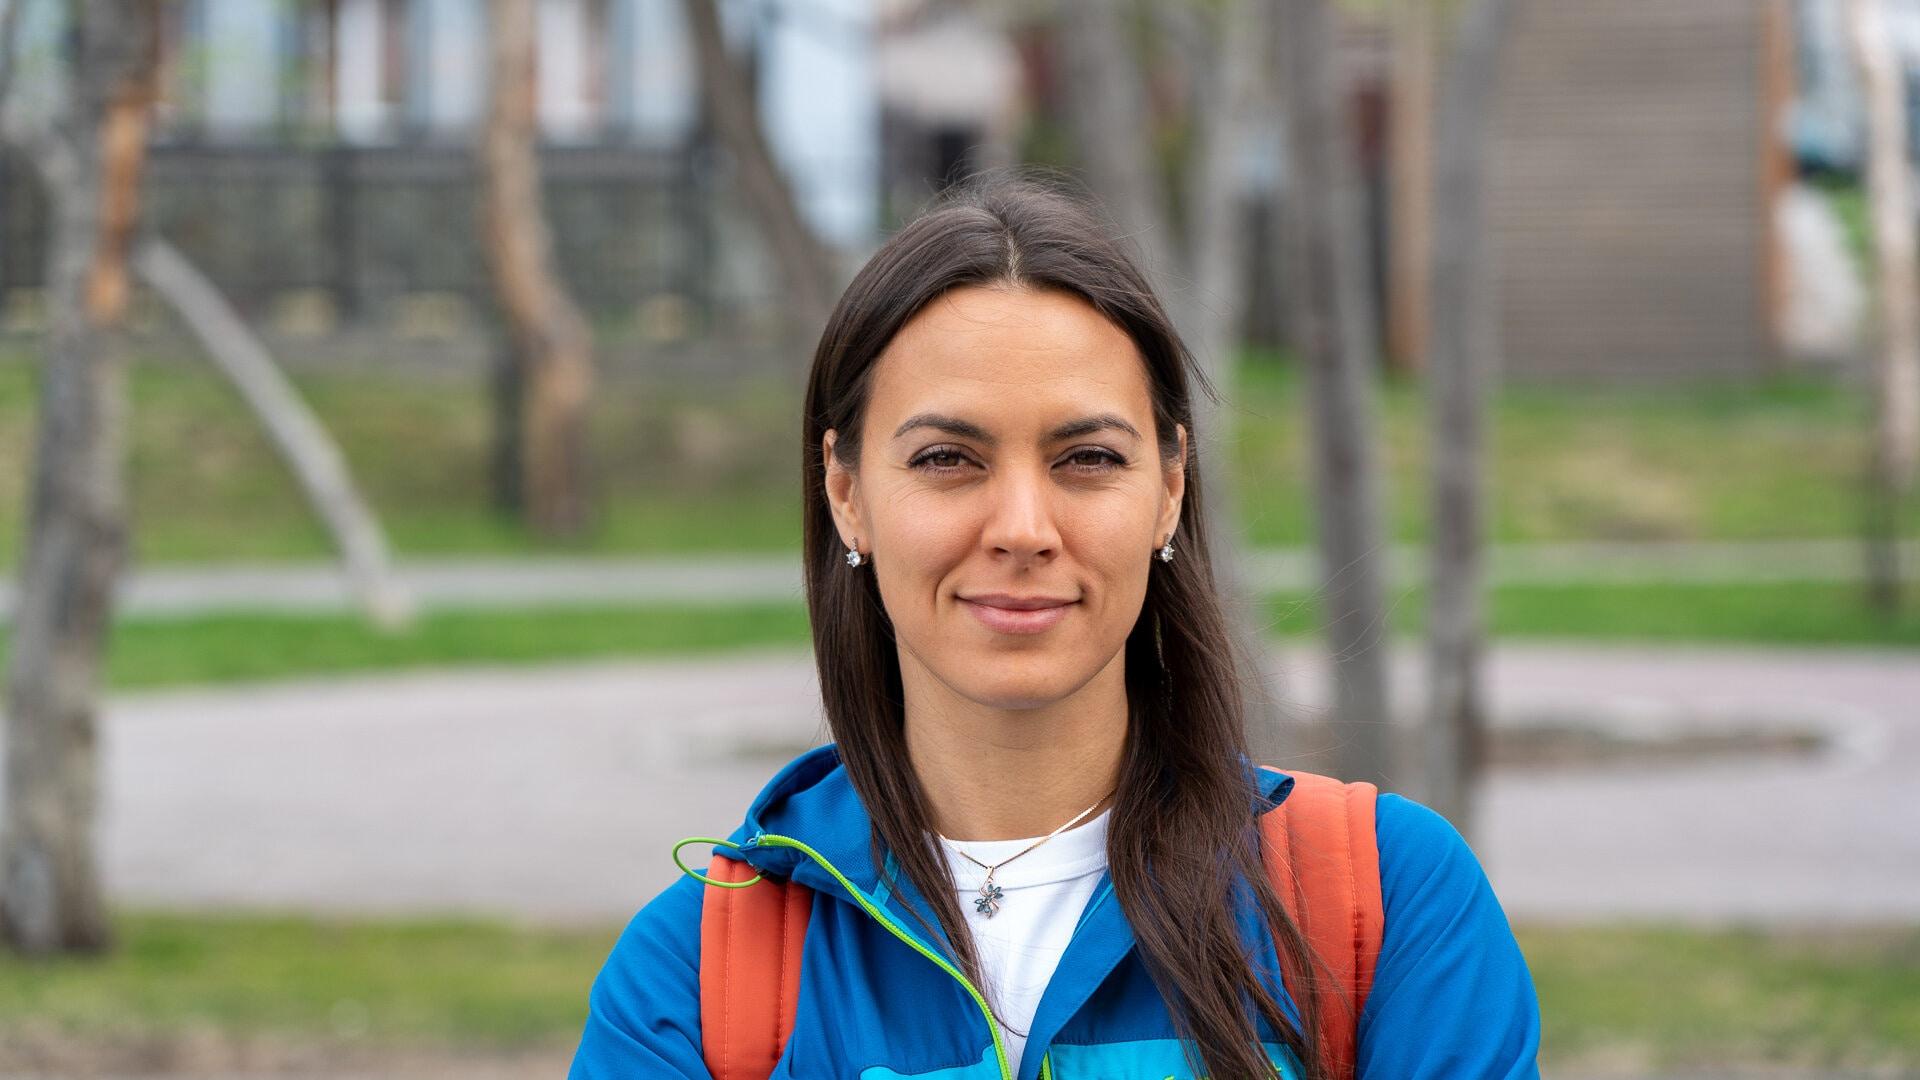 София Махнаткина